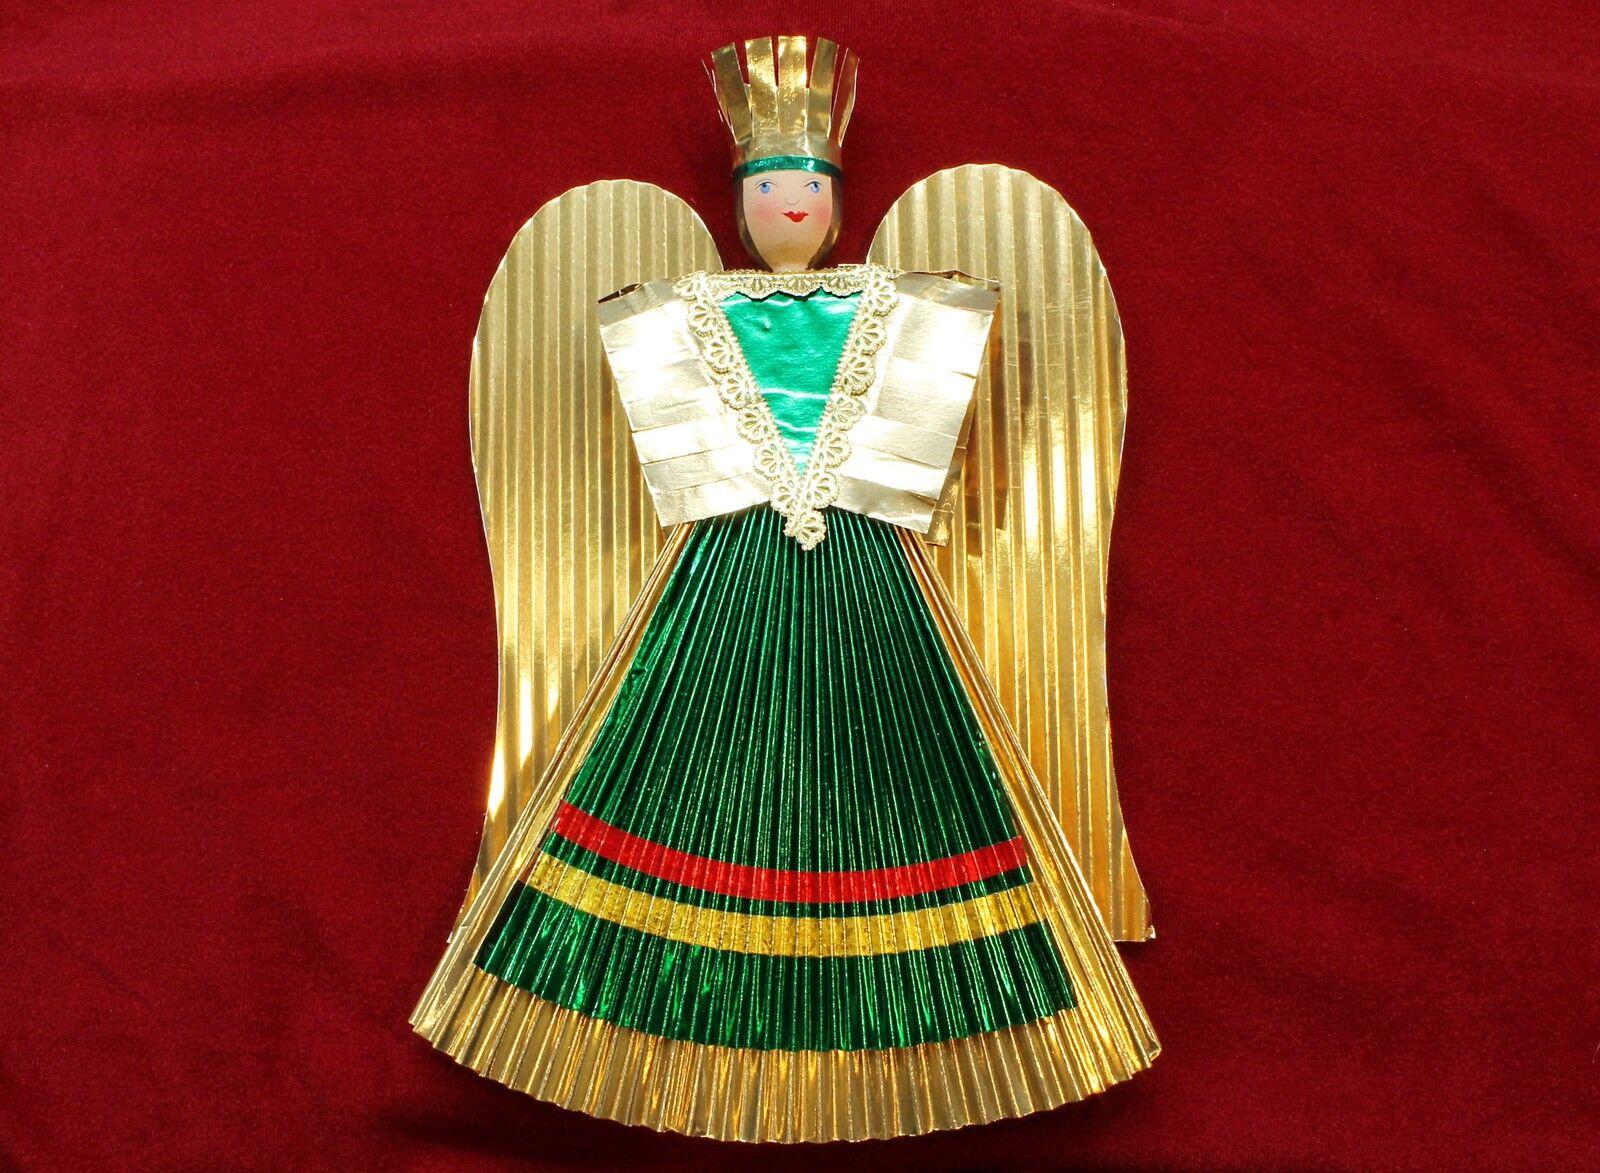 Núremberg oro Foil Angel - Hecho a Mano Angel Handmade de 12cm Hasta